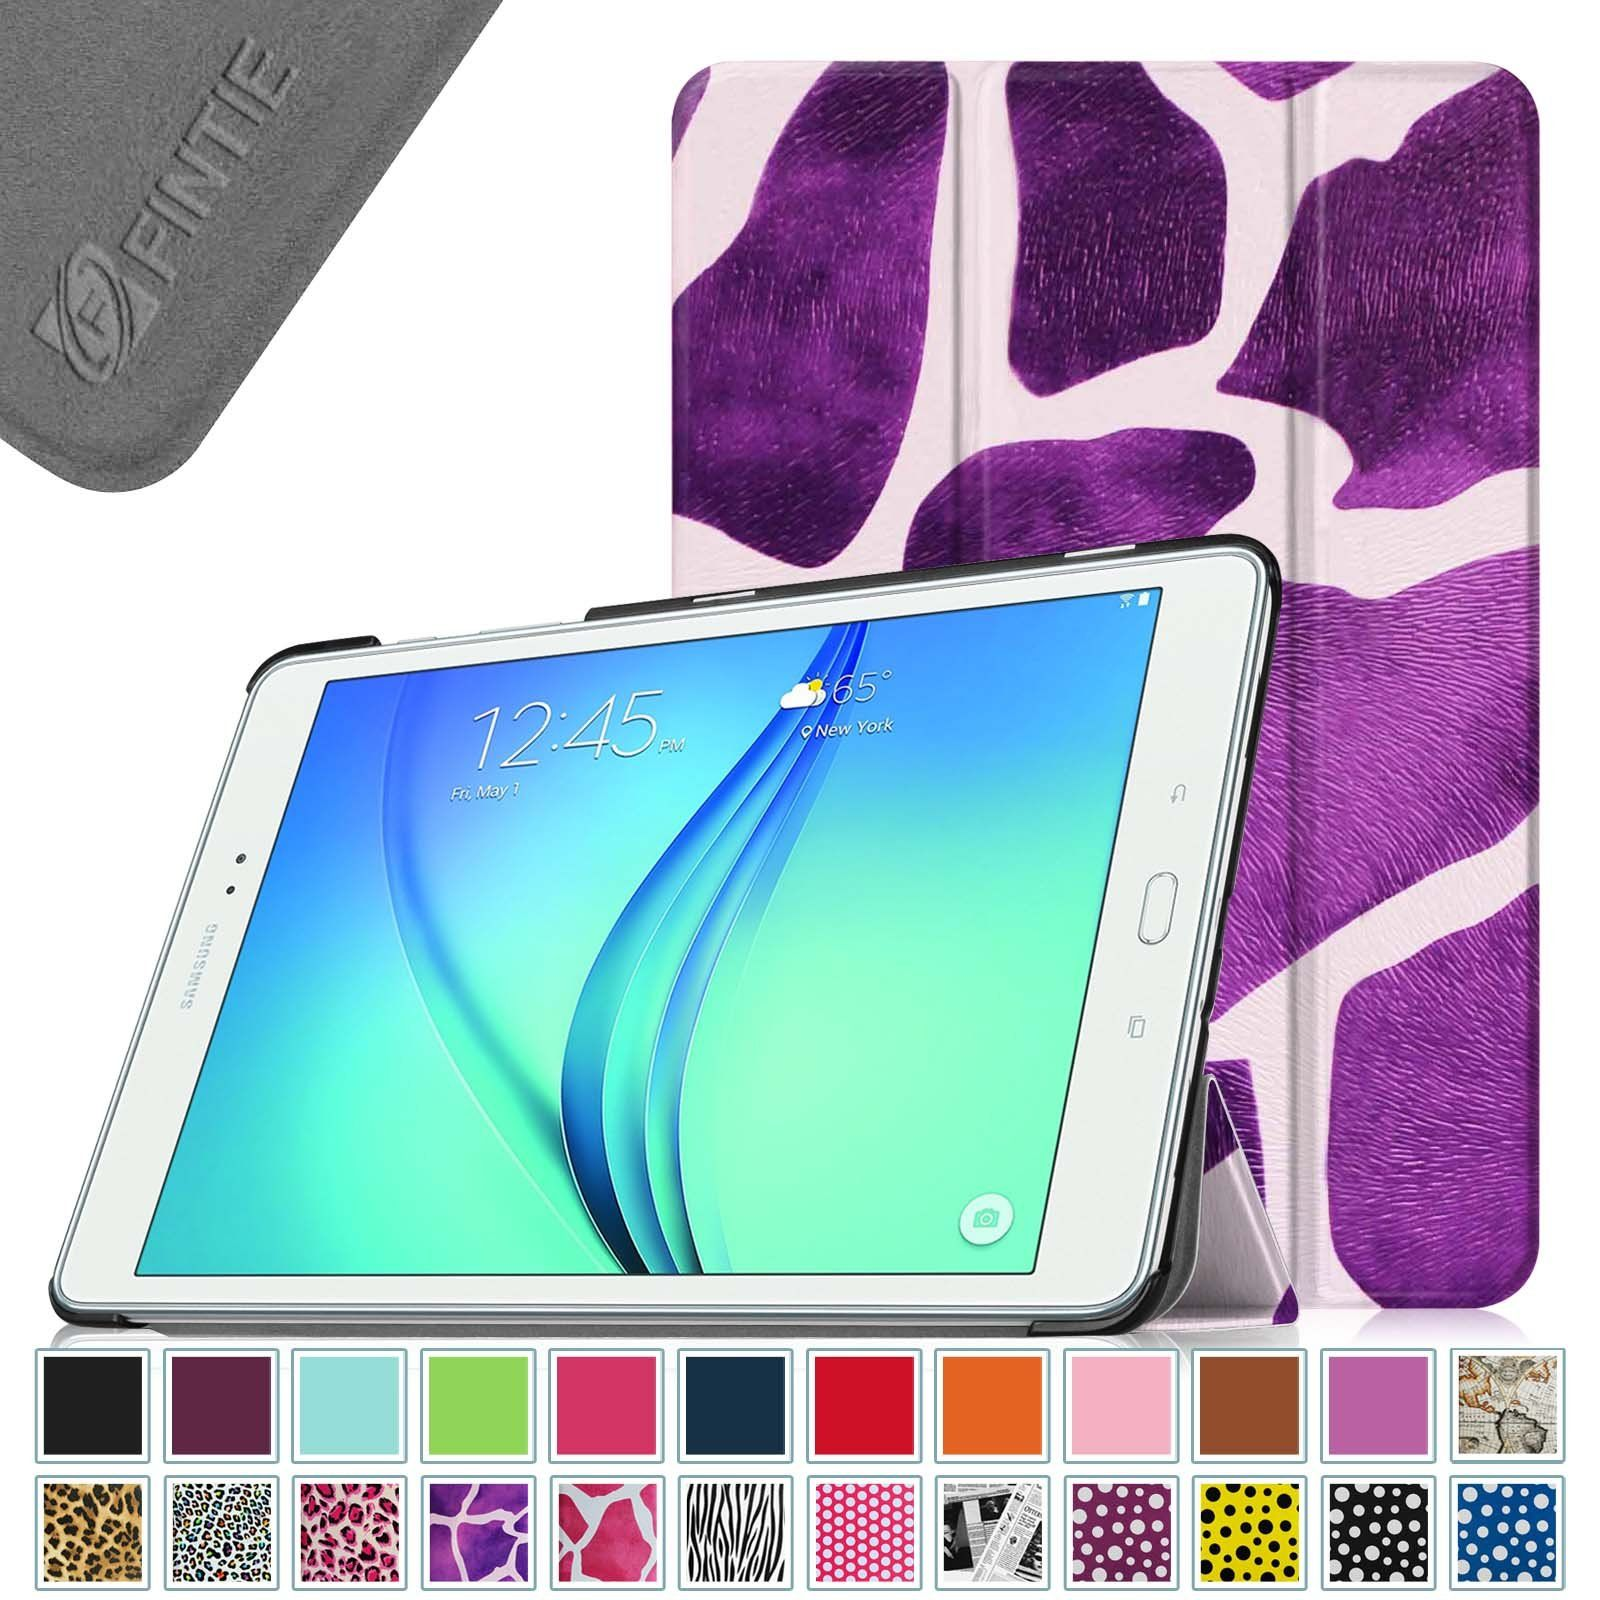 Fintie Samsung Galaxy Tab A 9.7 Smart Shell Case - Ultra Slim Lightweight Stand Cover with Auto Sleep/Wake Feature for Samsung Galaxy Tab A 9.7-Inch Tablet SM-T550, Giraffe Purple